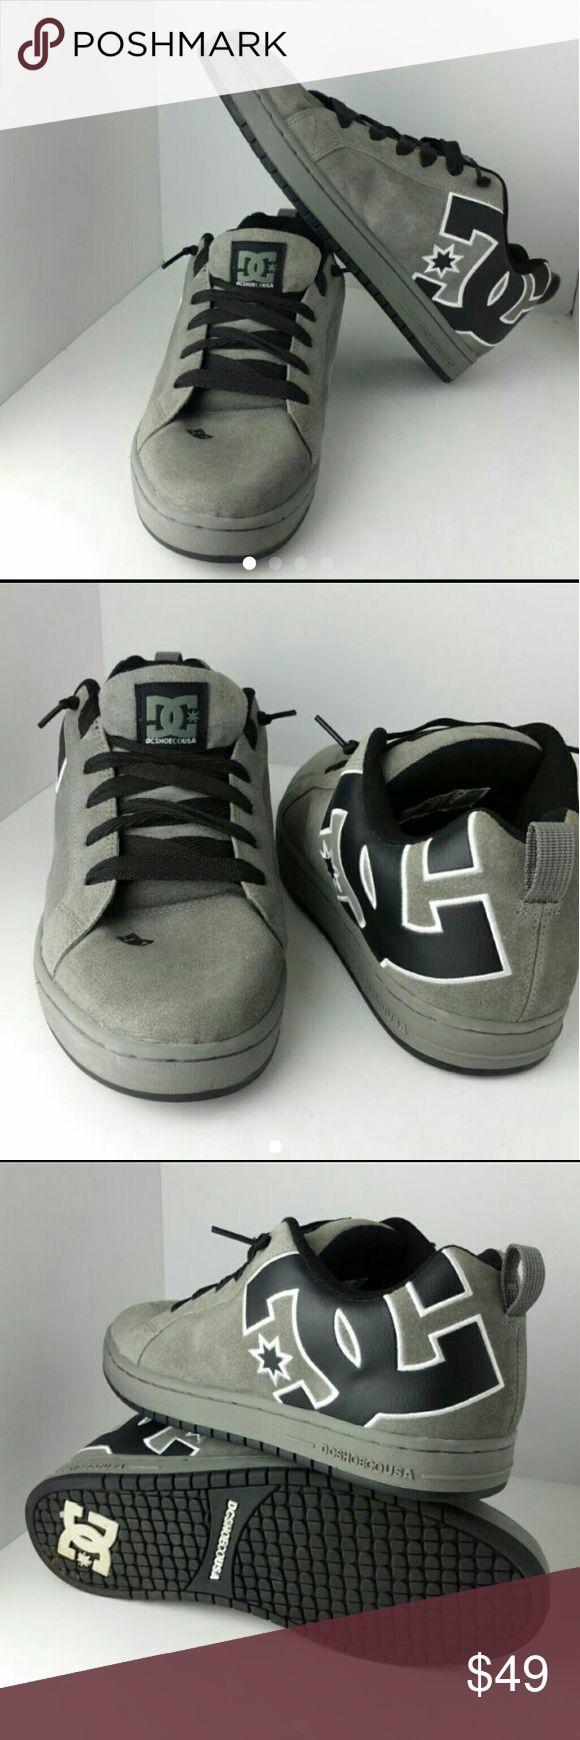 DC SHOES MEN'S FASHION SNEAKERS LIKE NEW   SKE # JZ dc shoes  Shoes Sneakers